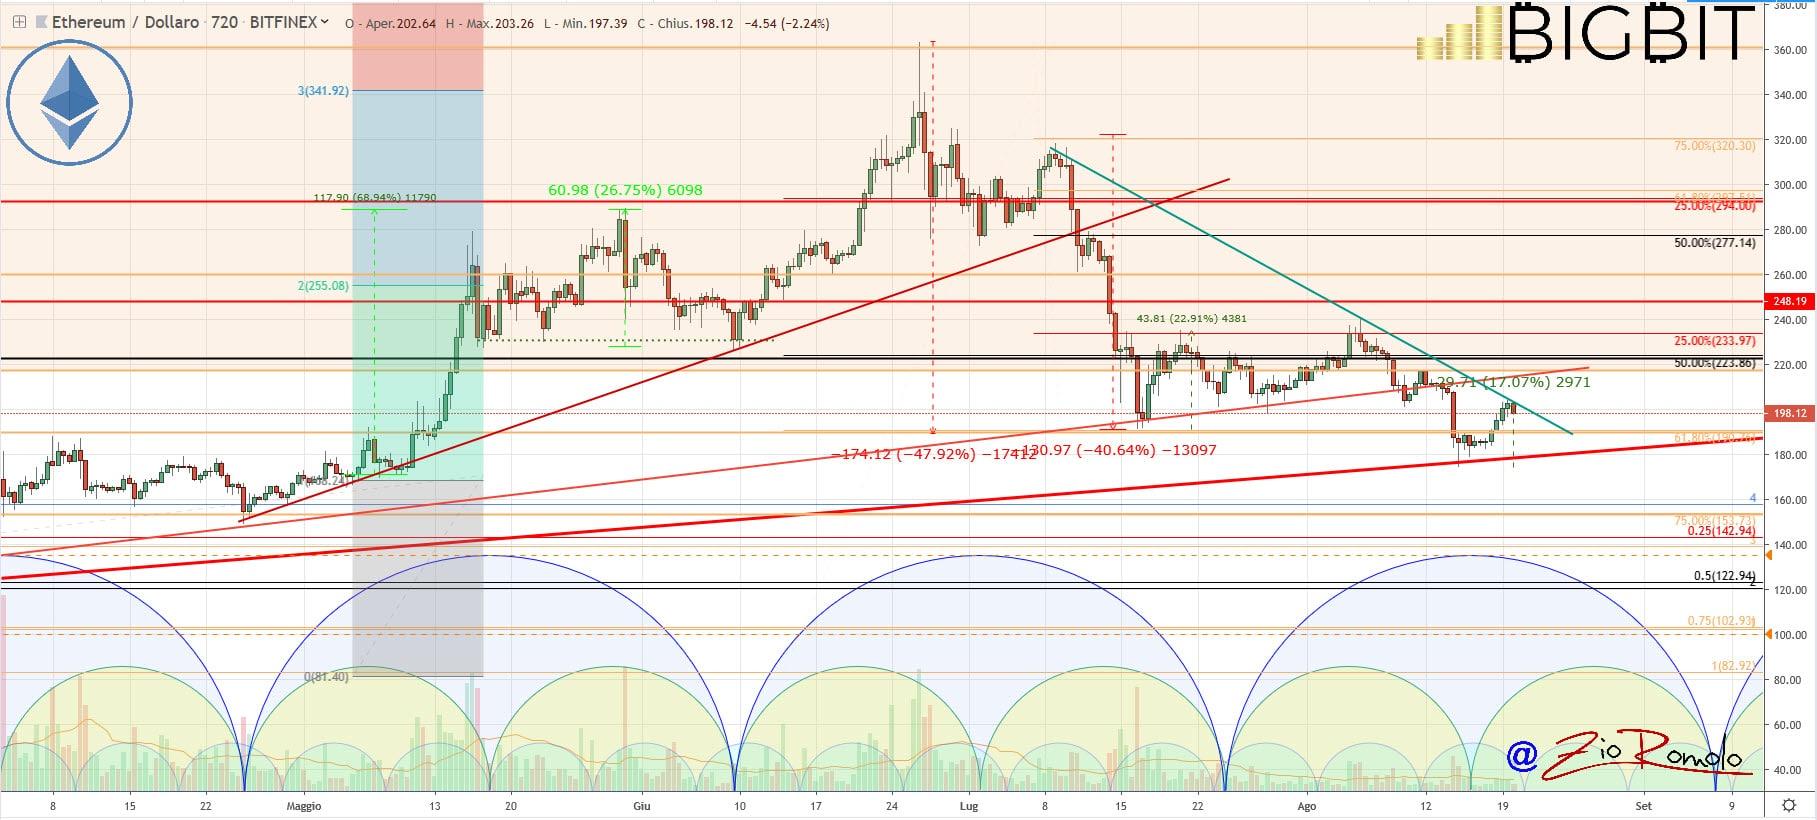 bitcoin prices bounce